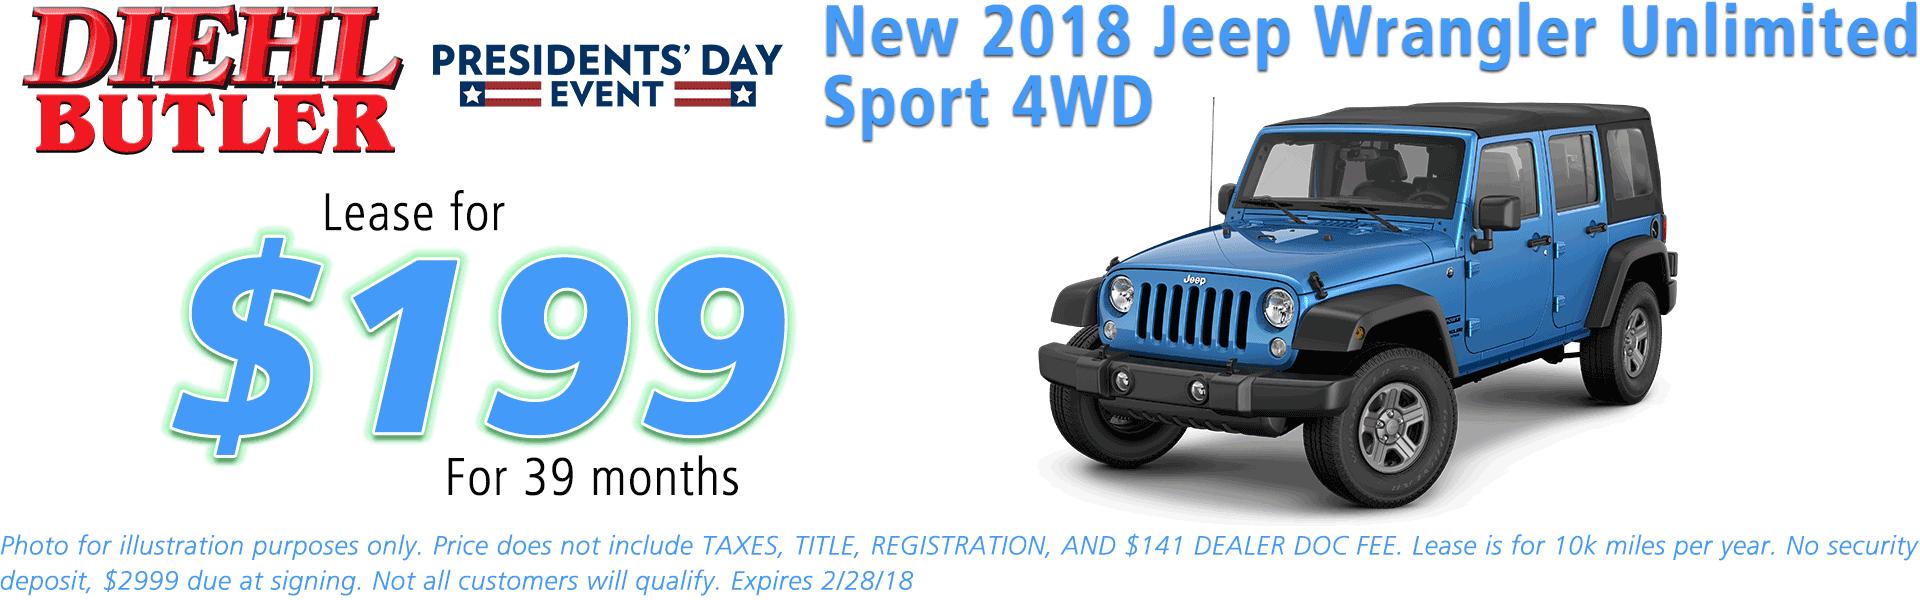 NEW 2018 JEEP WRANGLER JK UNLIMITED SPORT 4X4 diehl automotive butler pa 16002 chrysler jeep dodge ram